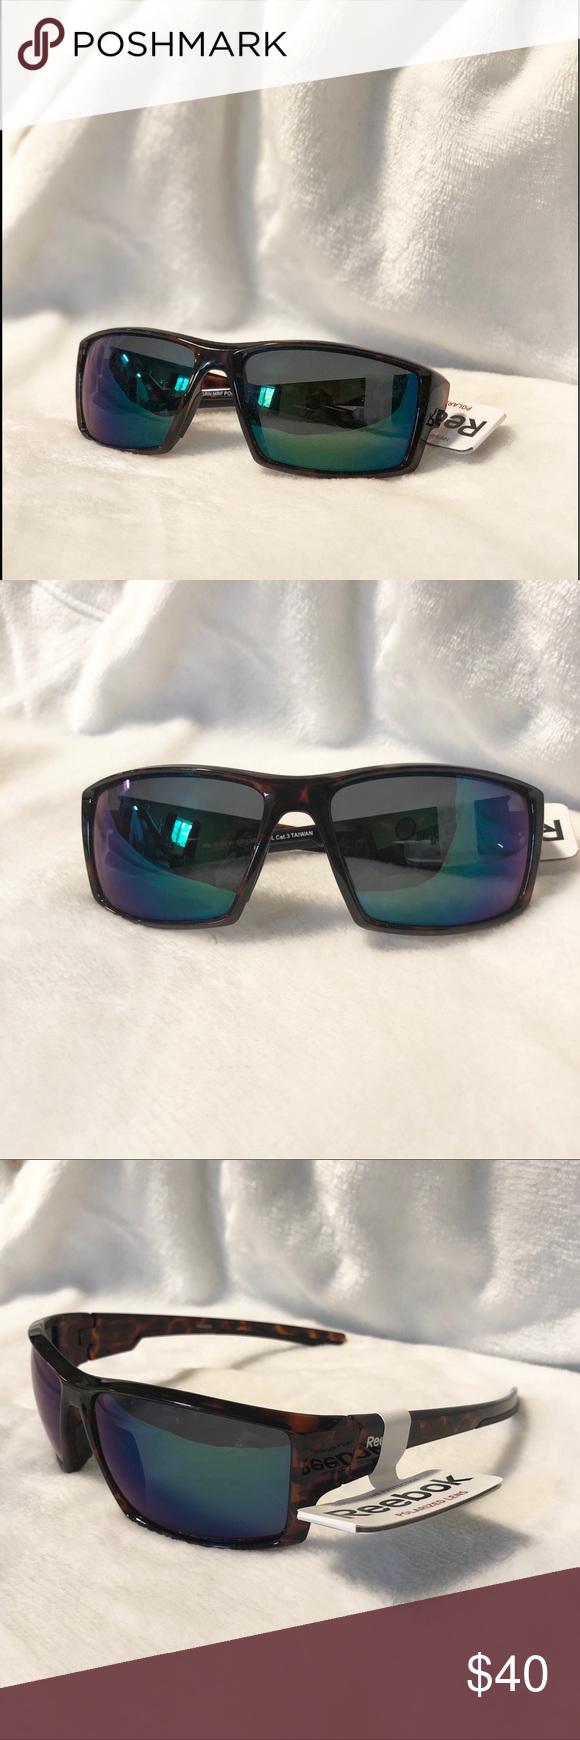 6a0abadb0b Polarized Sunglasses Polarized sunglasses by Reebok. Tortoise shell frames.  NWT. Reebok Accessories Sunglasses